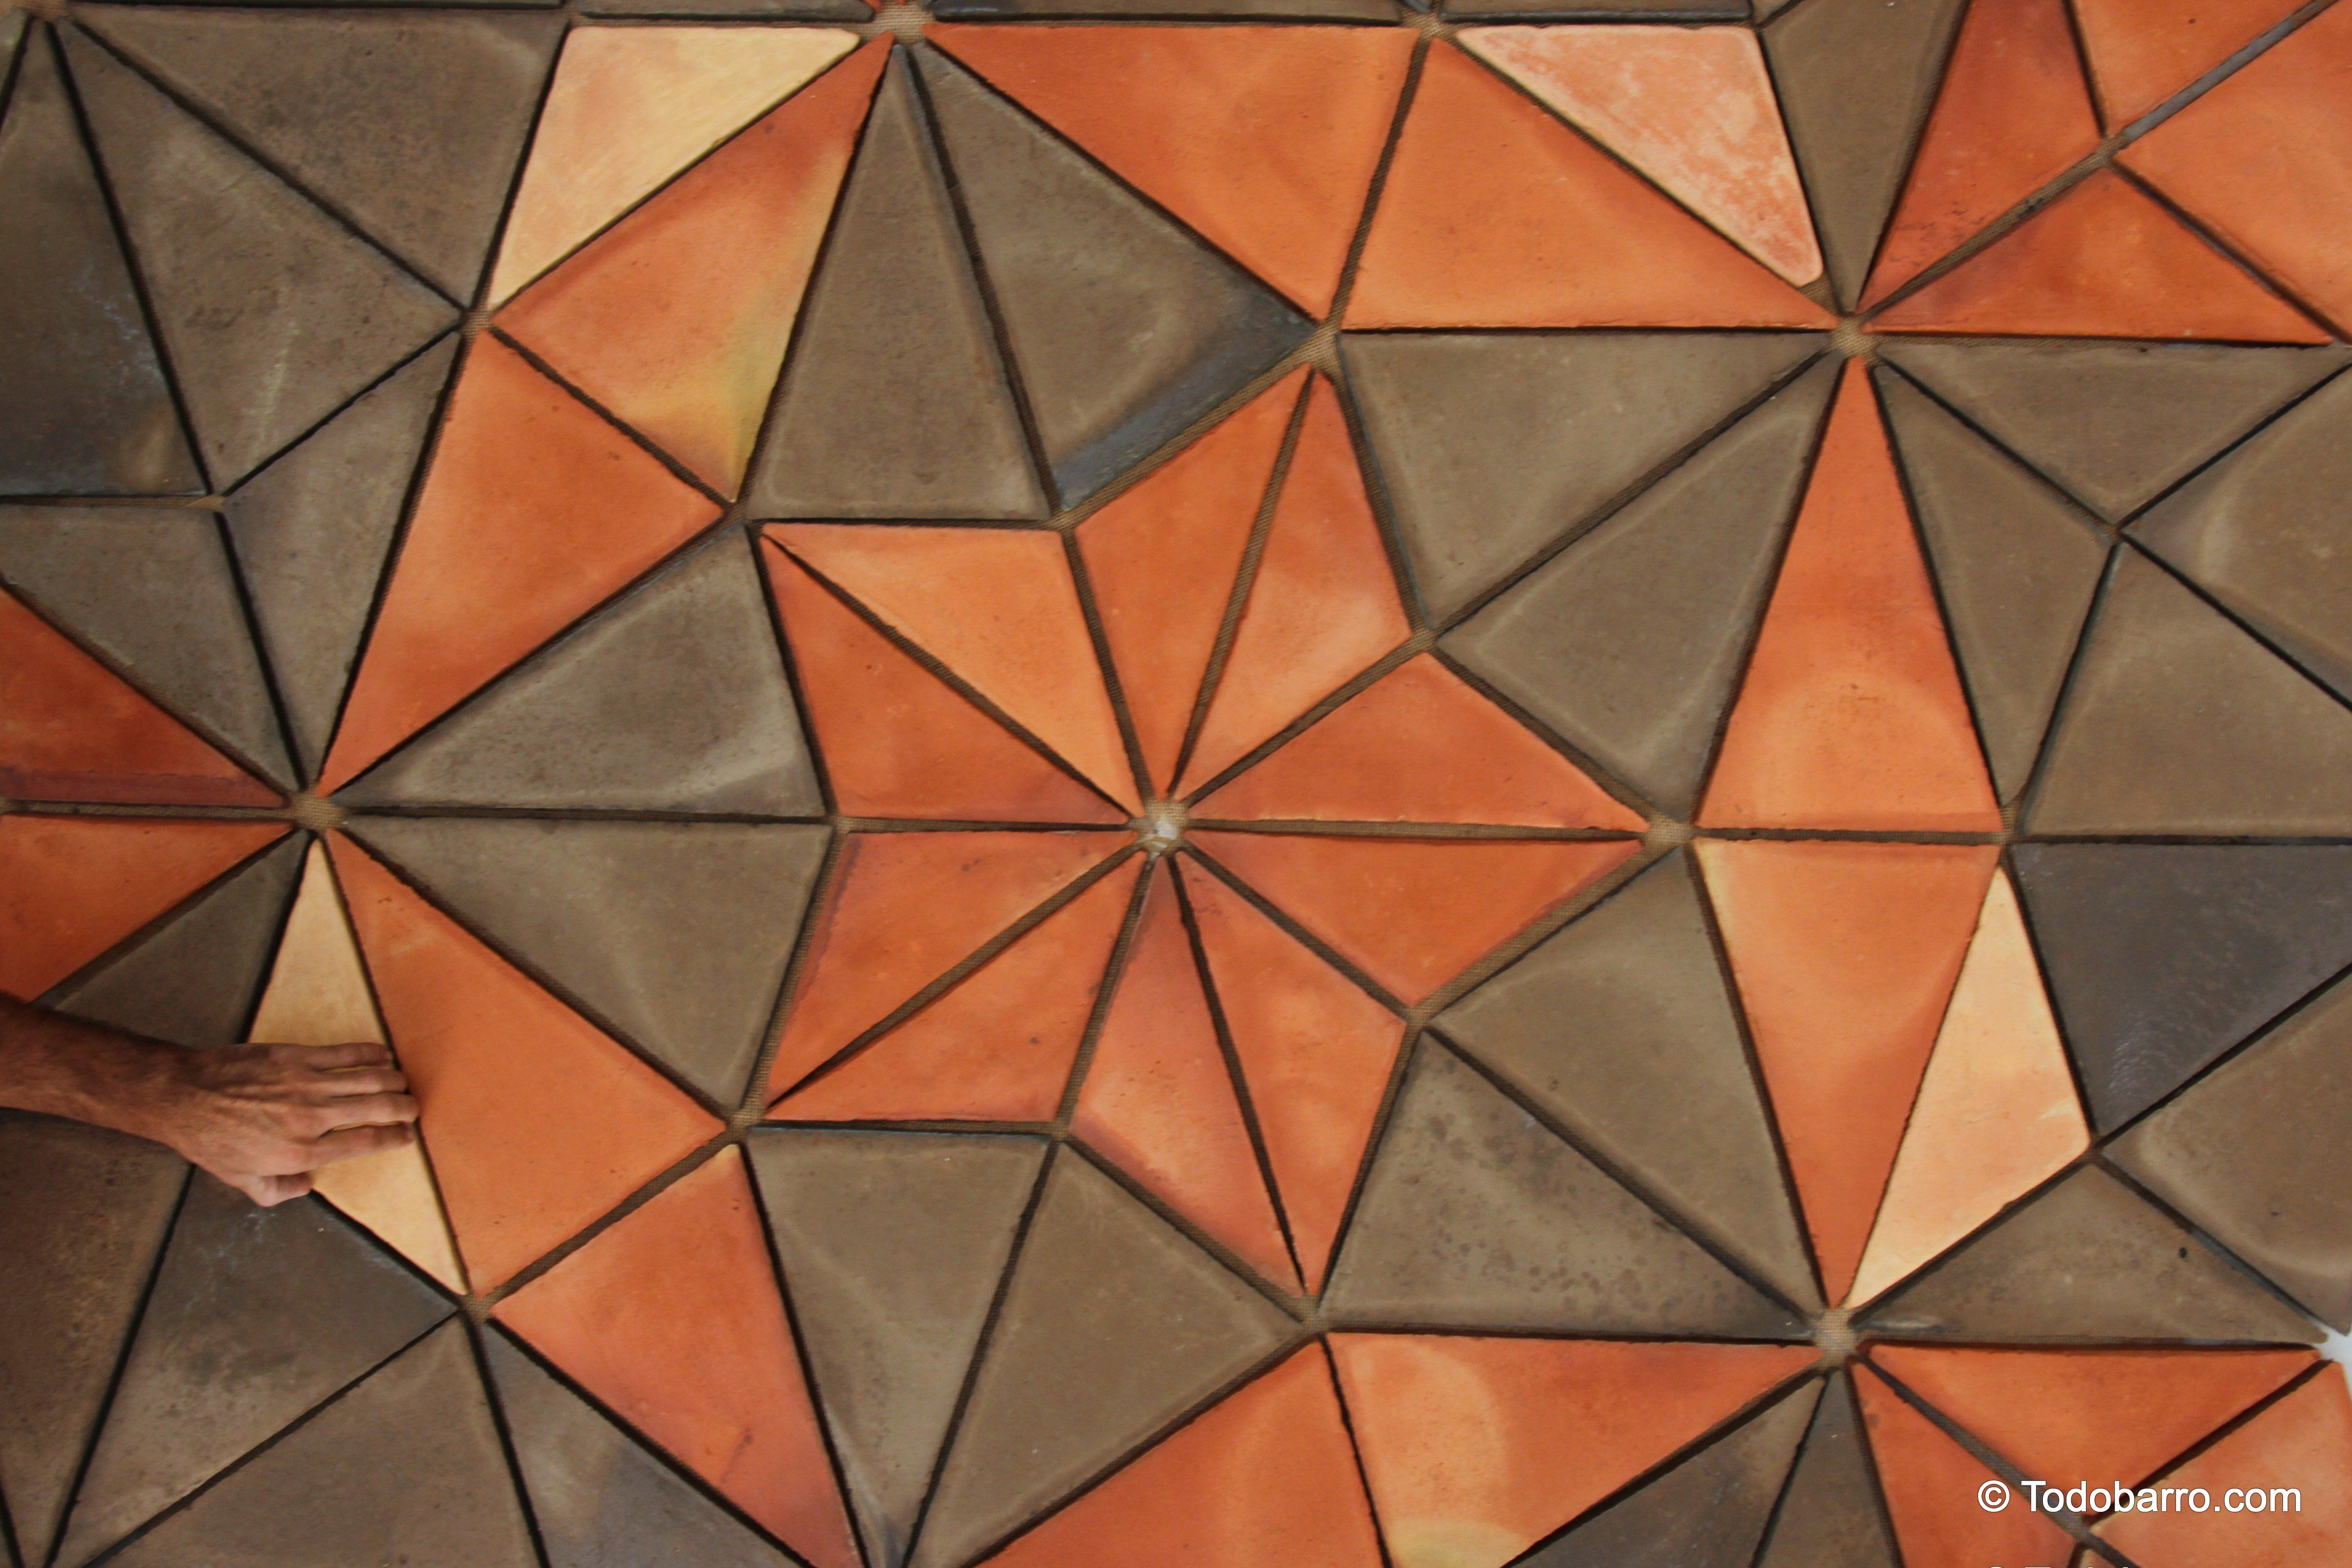 Teselado de penrose spanish terracotta floor tiles todobarro teselado de penrose spanish terracotta floor tiles dailygadgetfo Images